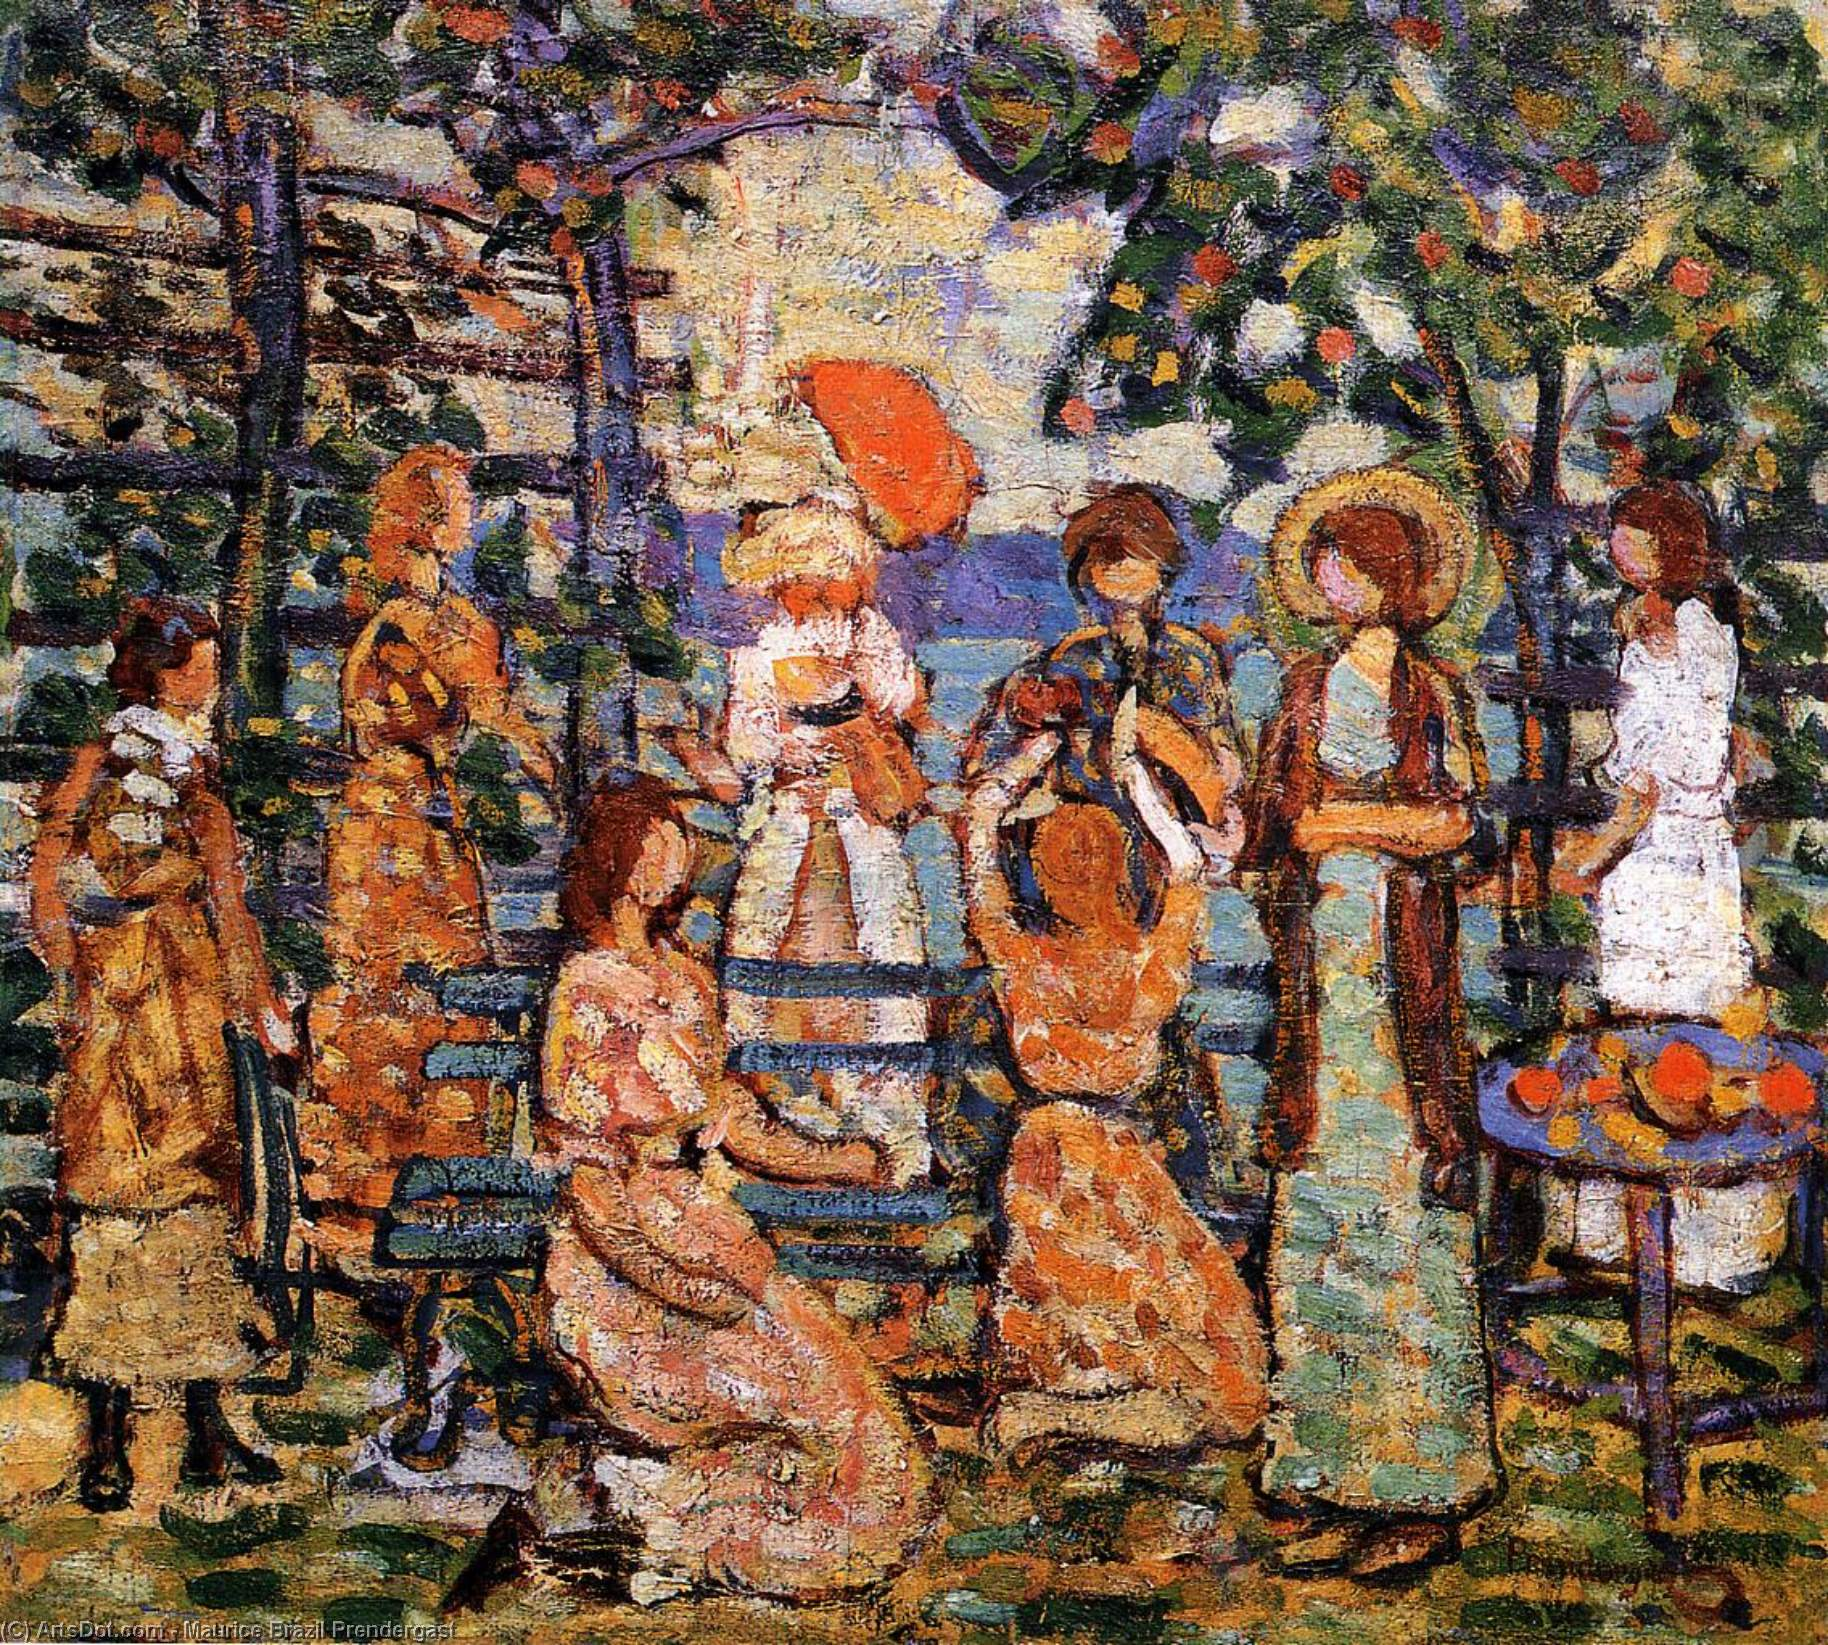 Wikioo.org - The Encyclopedia of Fine Arts - Painting, Artwork by Maurice Brazil Prendergast - Ladies in a Seaside Arbor